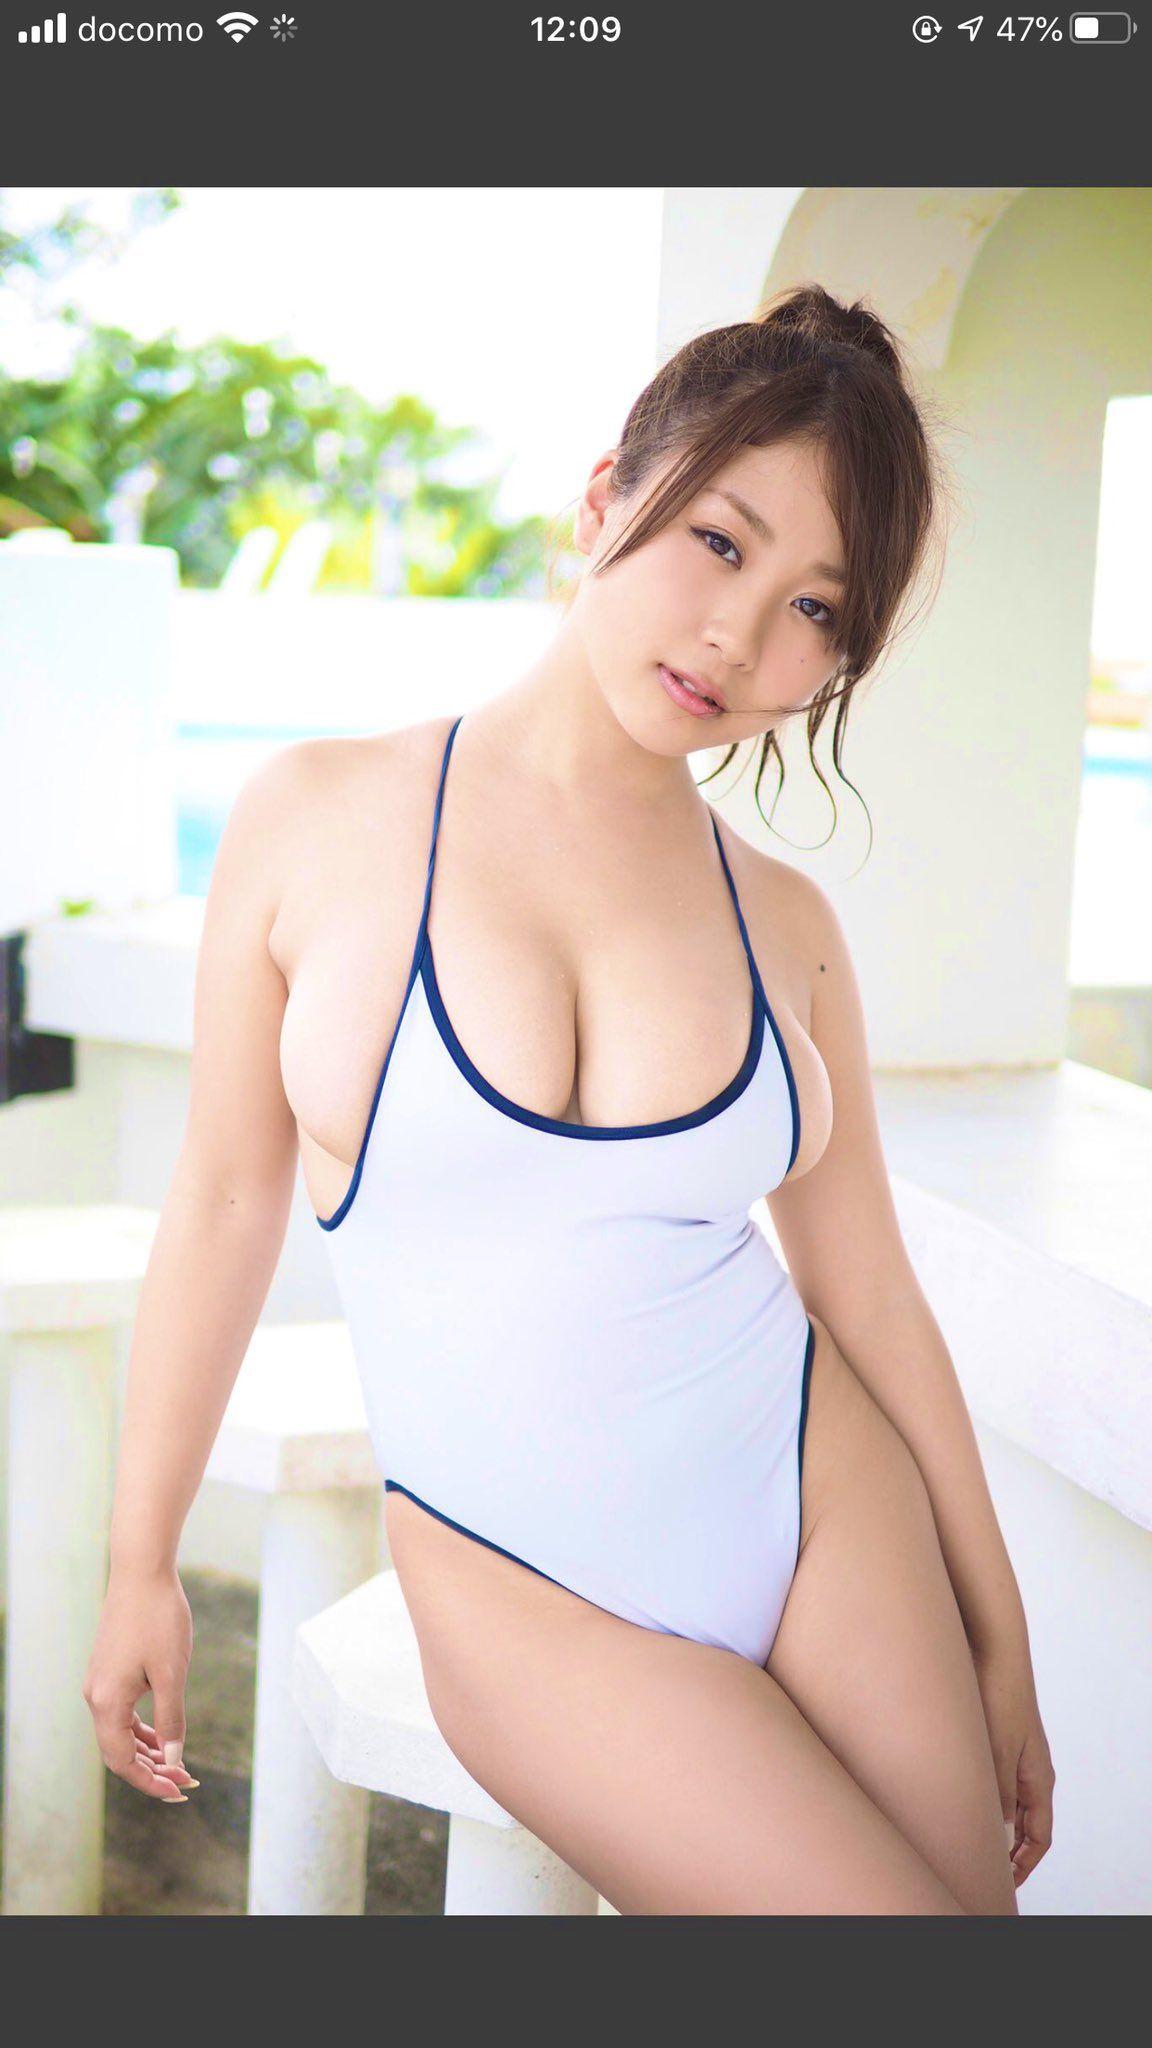 棒太郎ver 2 on twitter one piece swimwear 2 in